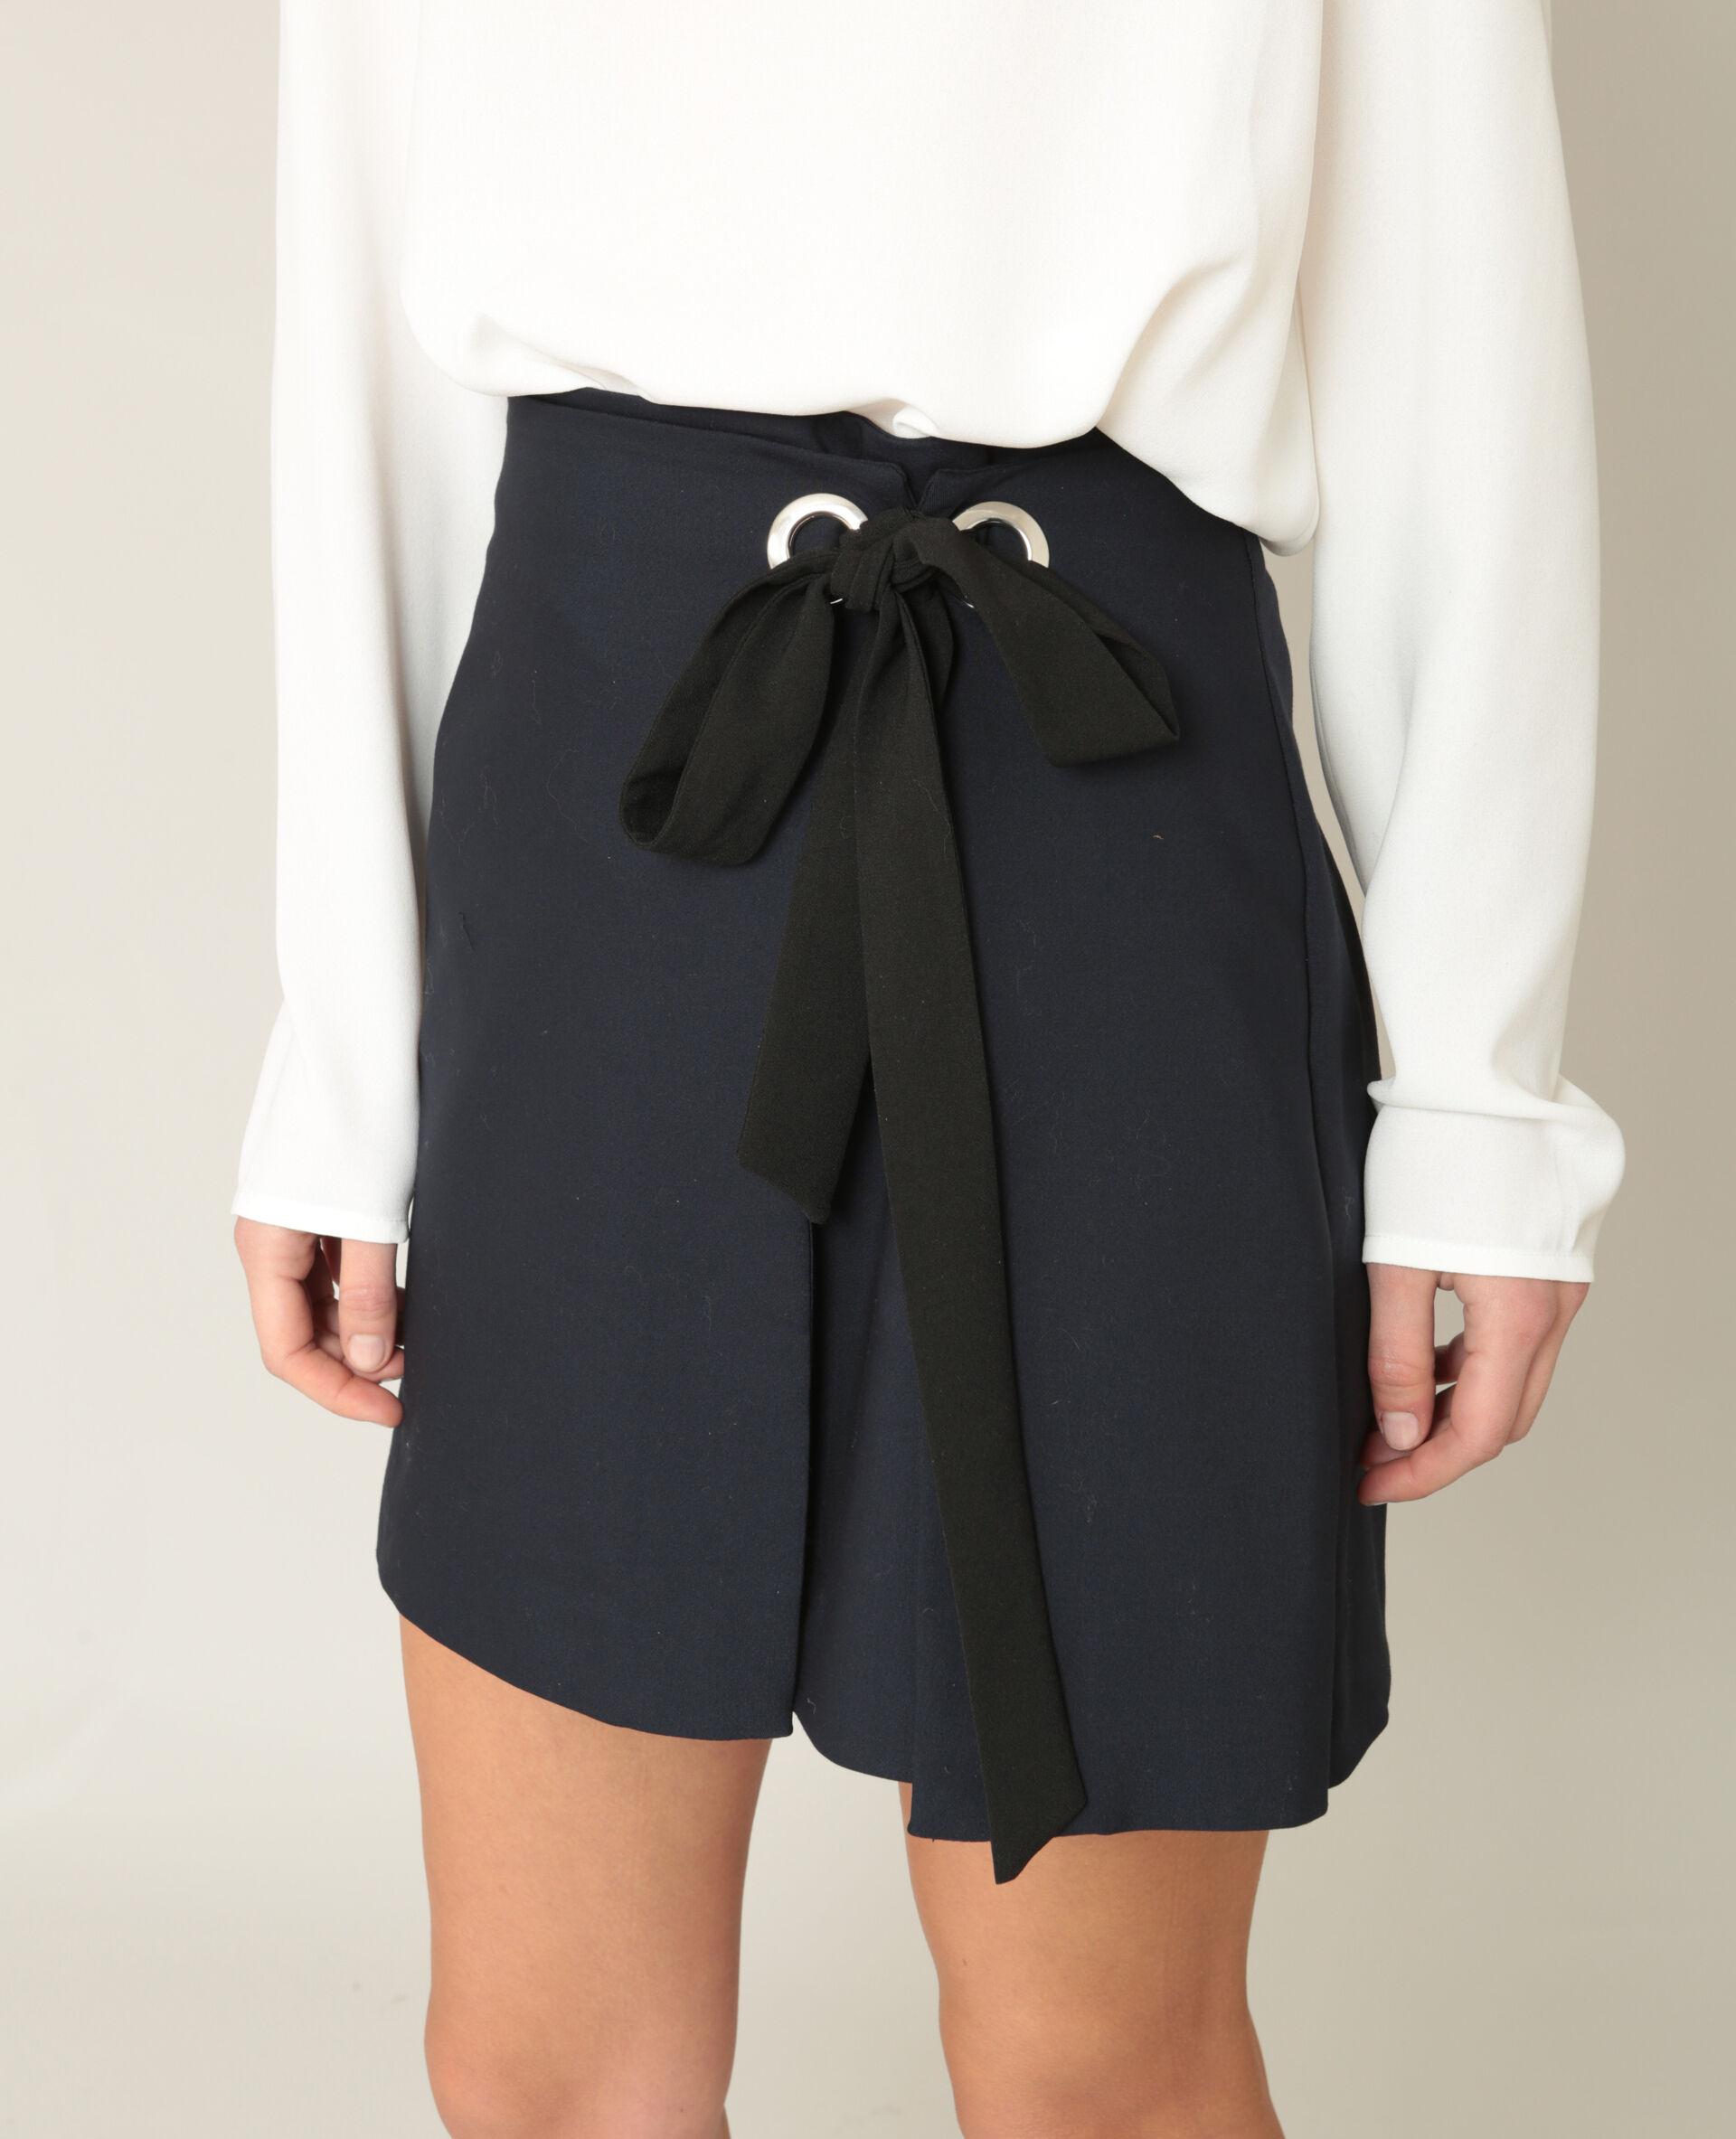 ✅Mini jupe portefeuille Femme - Couleur bleu marine - Taille 36 - PIMKIE - MODE FEMME